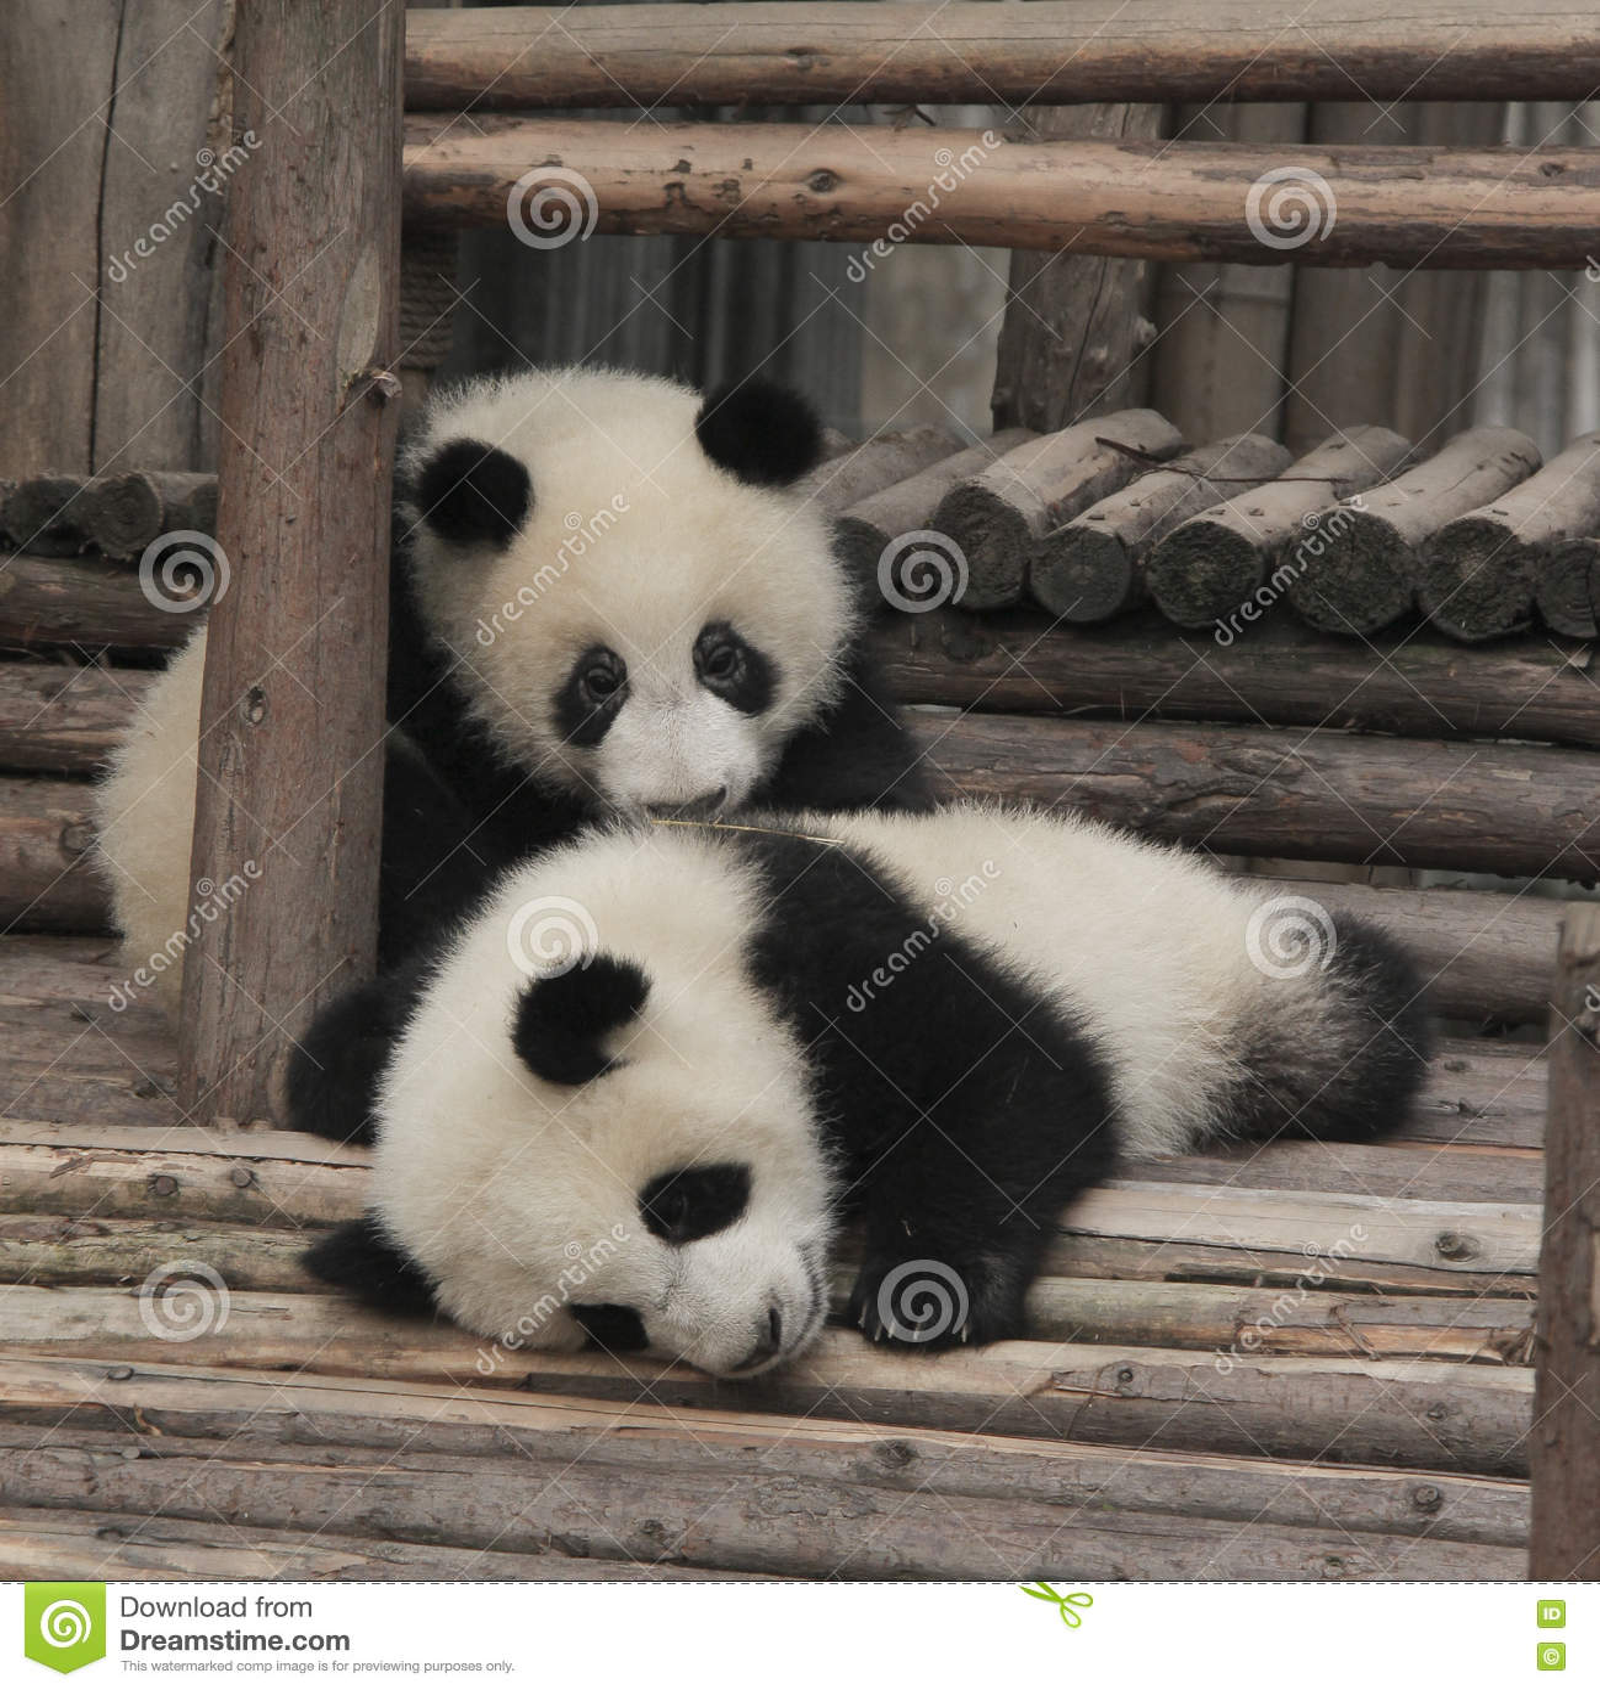 Giant Panda Cubs Playing Giant Panda Bea...